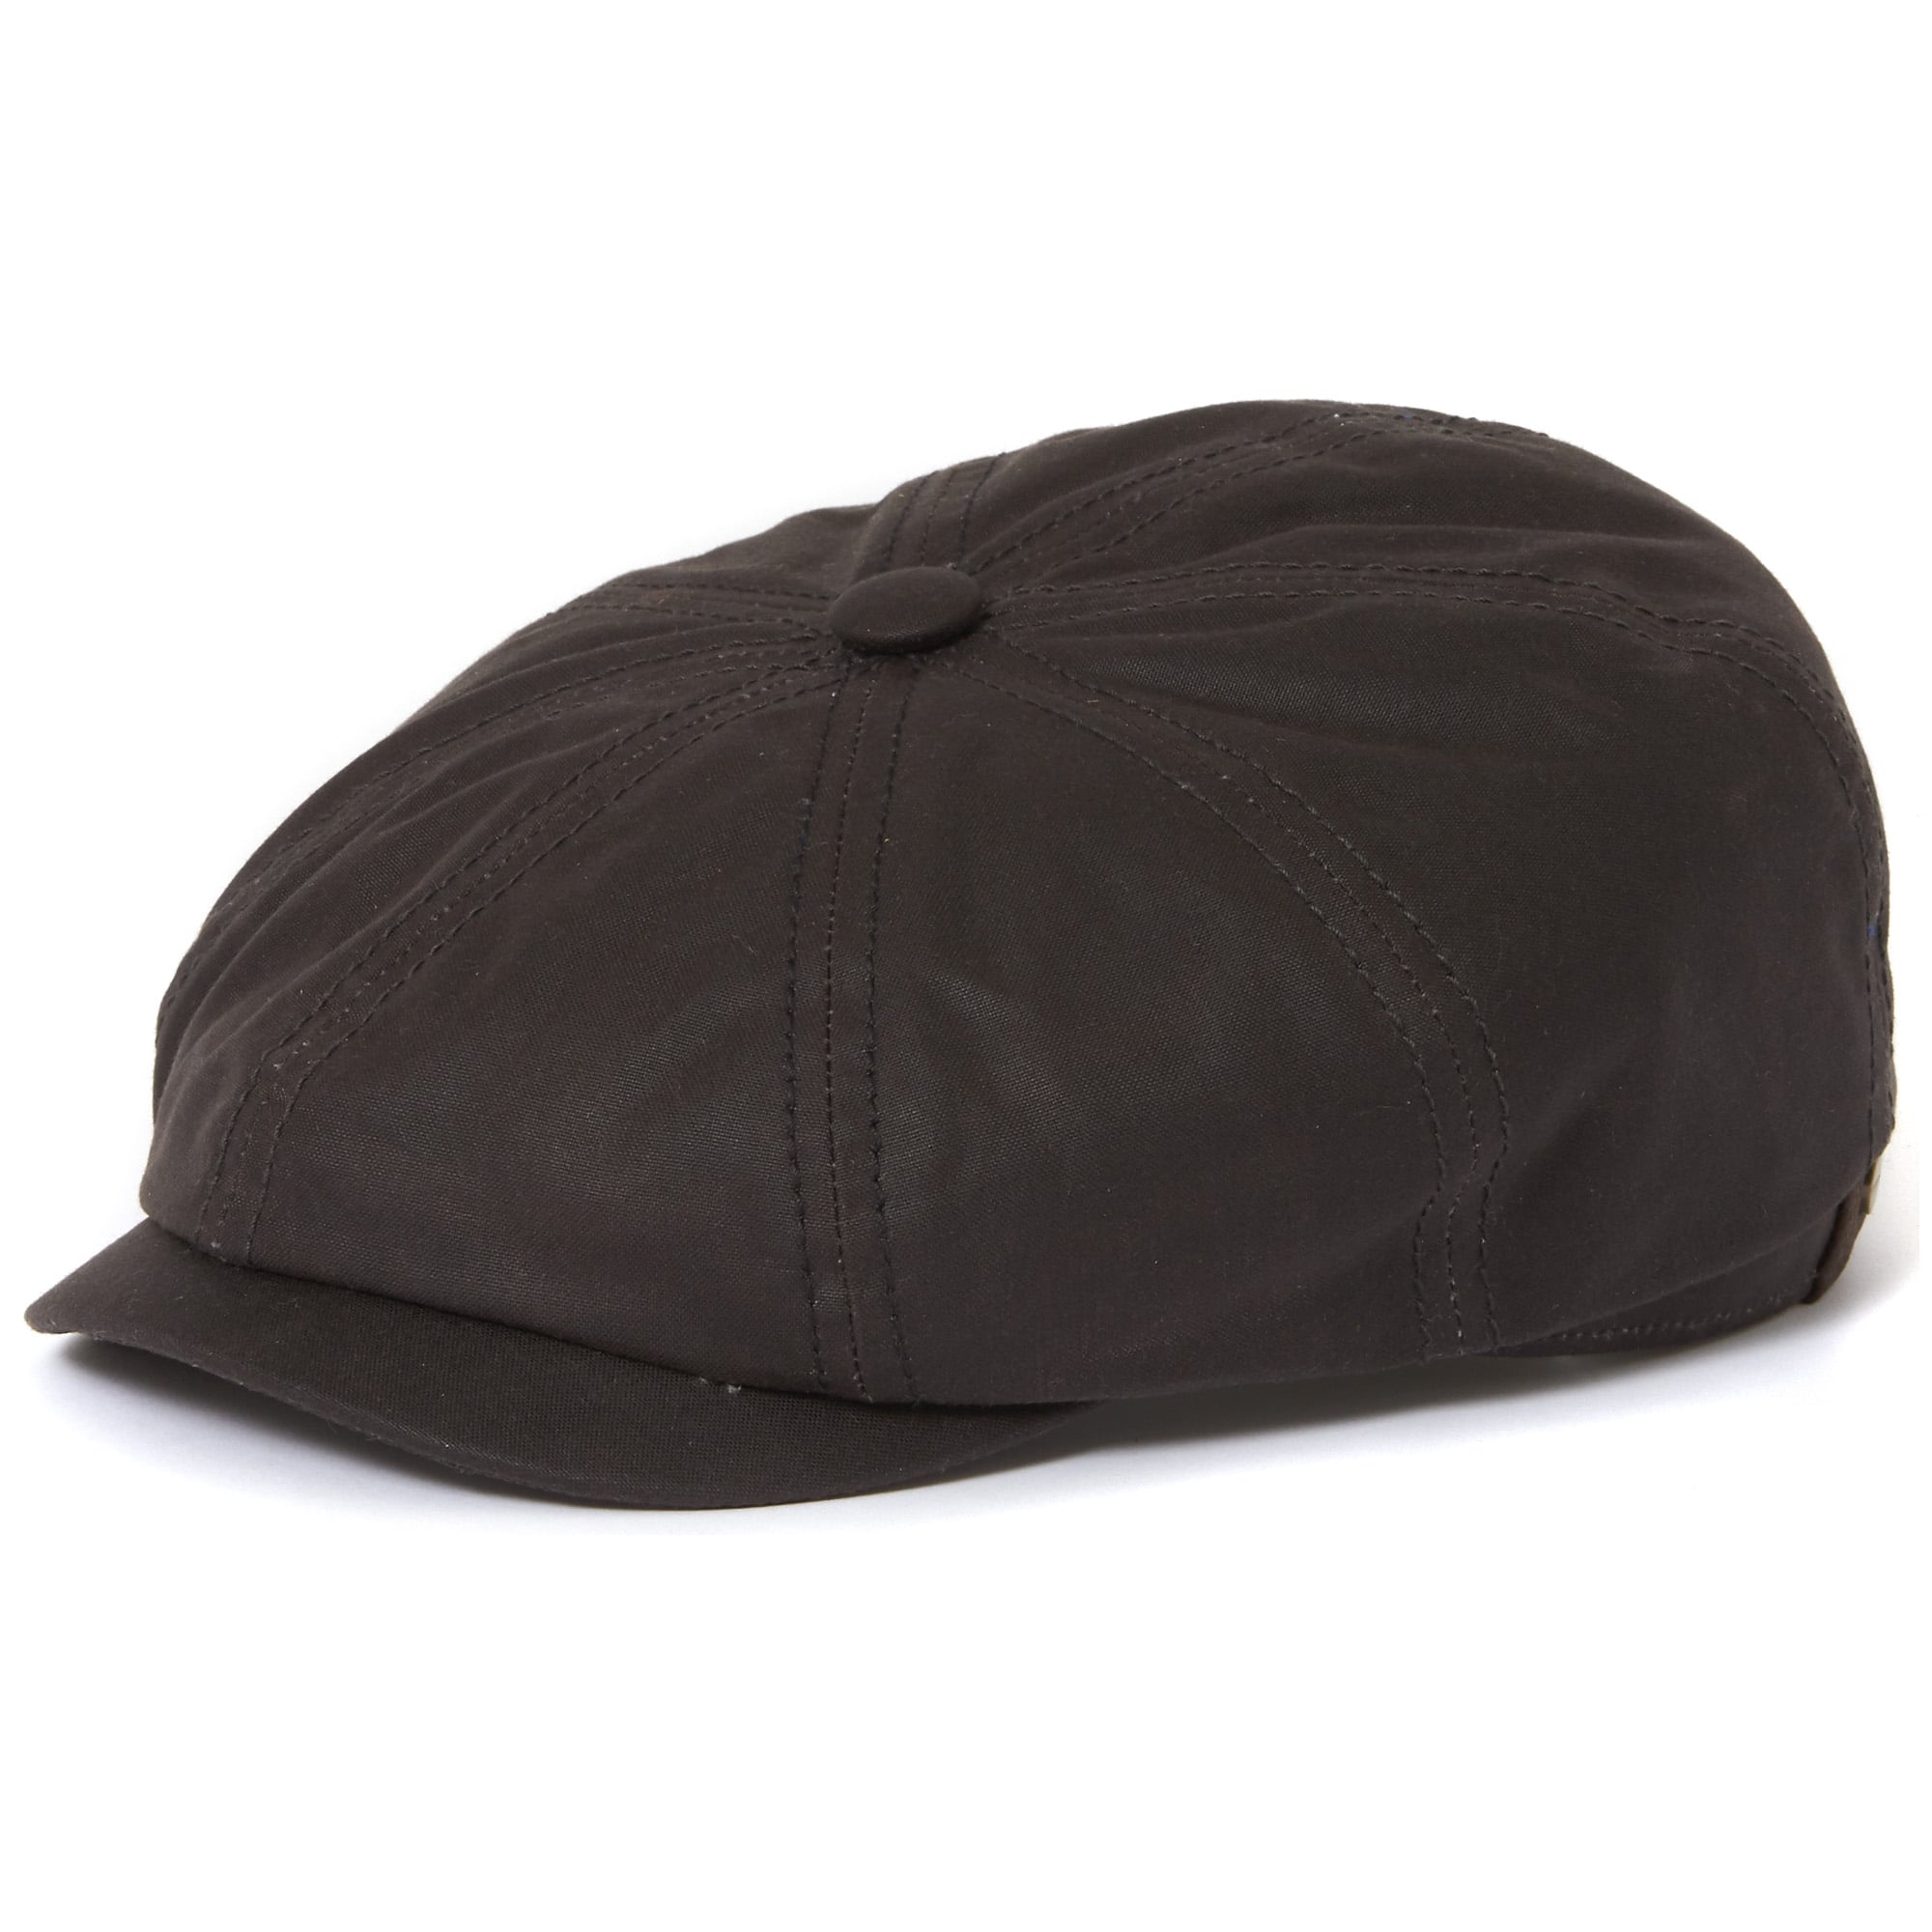 6546925f3f3 Stetson Hatteras Waxed Cotton Black Newsboy Cap